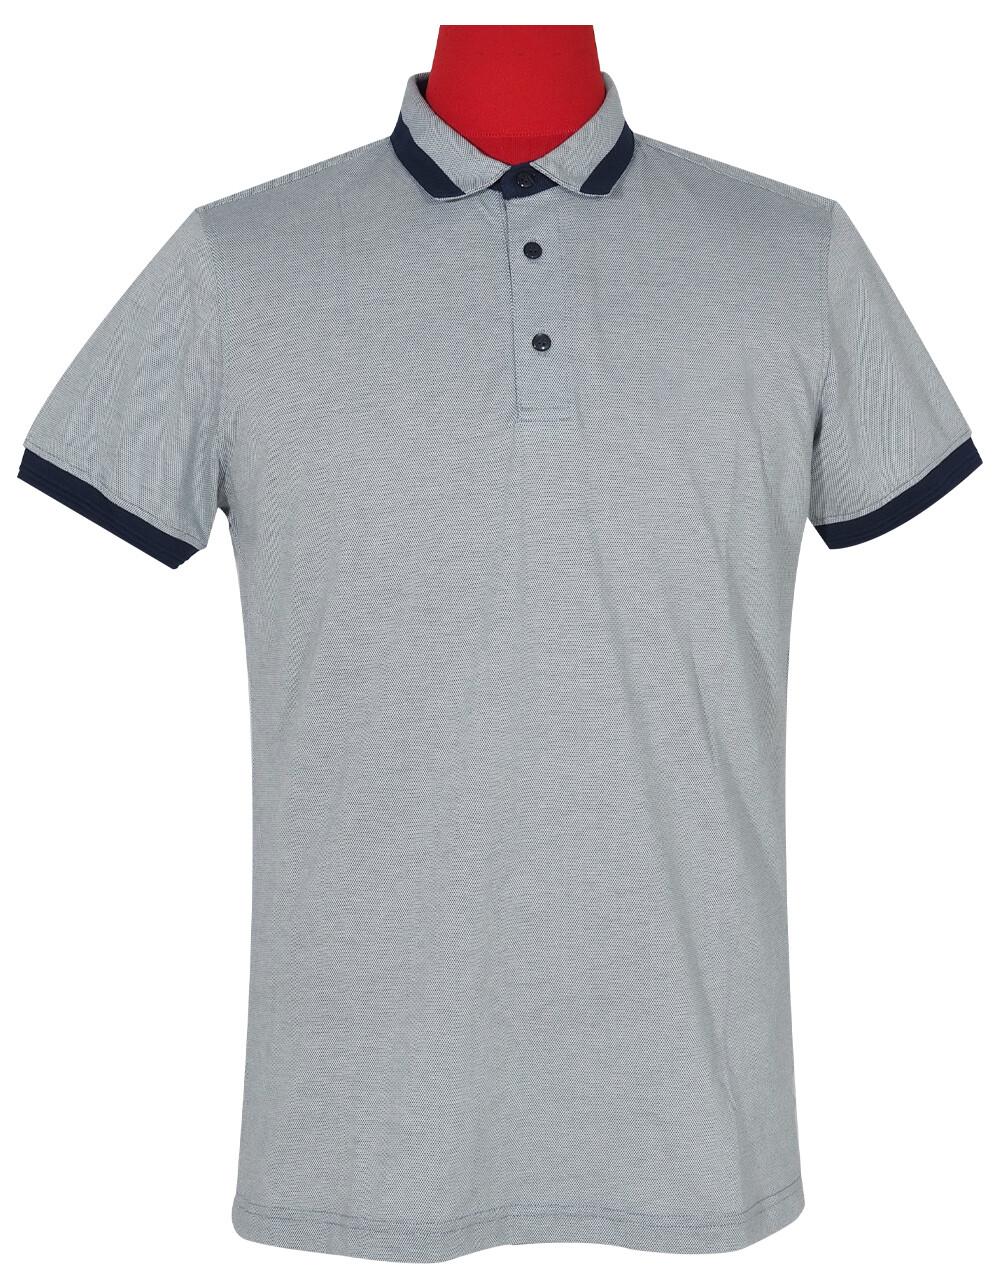 Polo Shirt Fabric Cool Plus Short Sleeve Colour Blue & Navy Blue Polo Shirt.